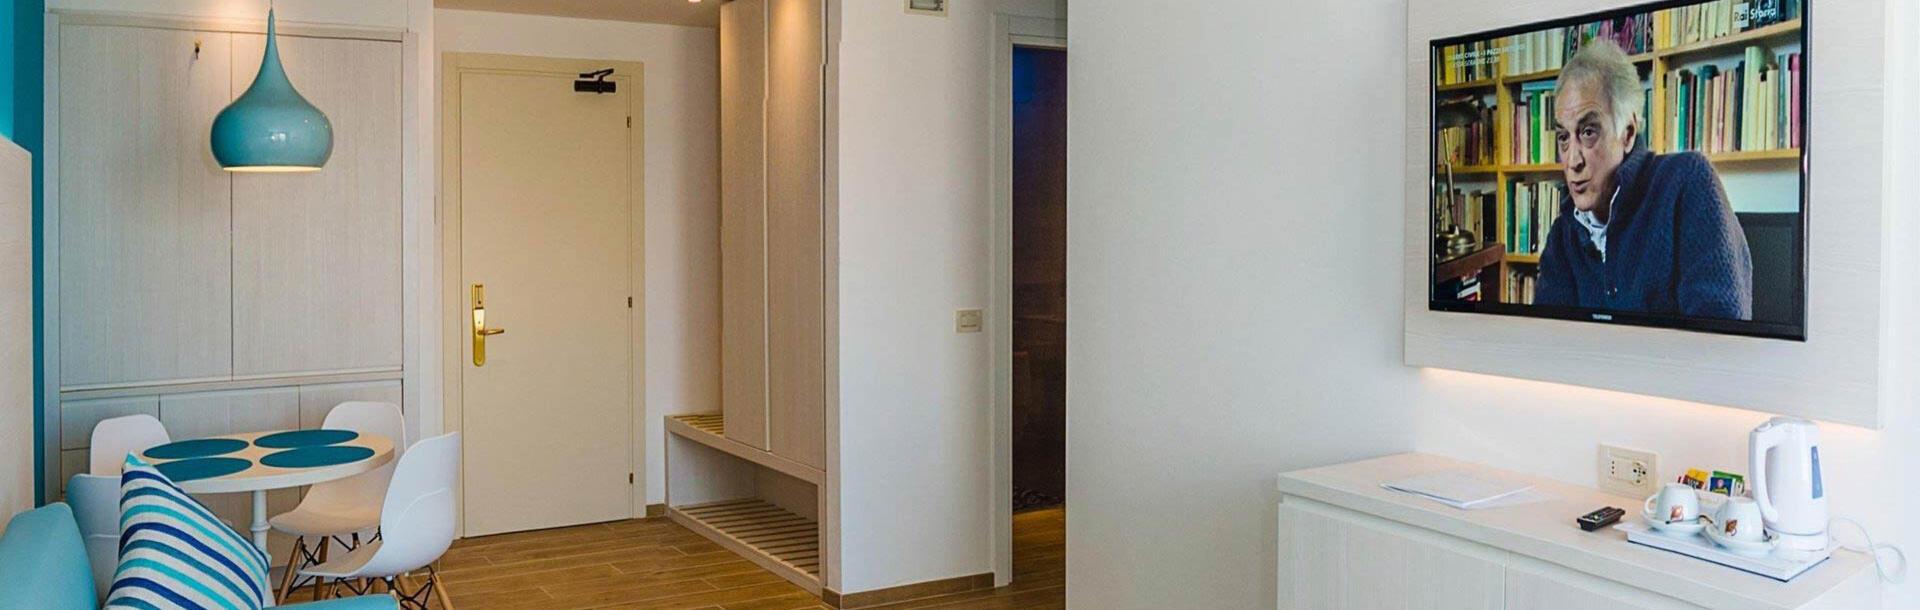 hotel-montecarlo pl family-living-aparment-bibione 013